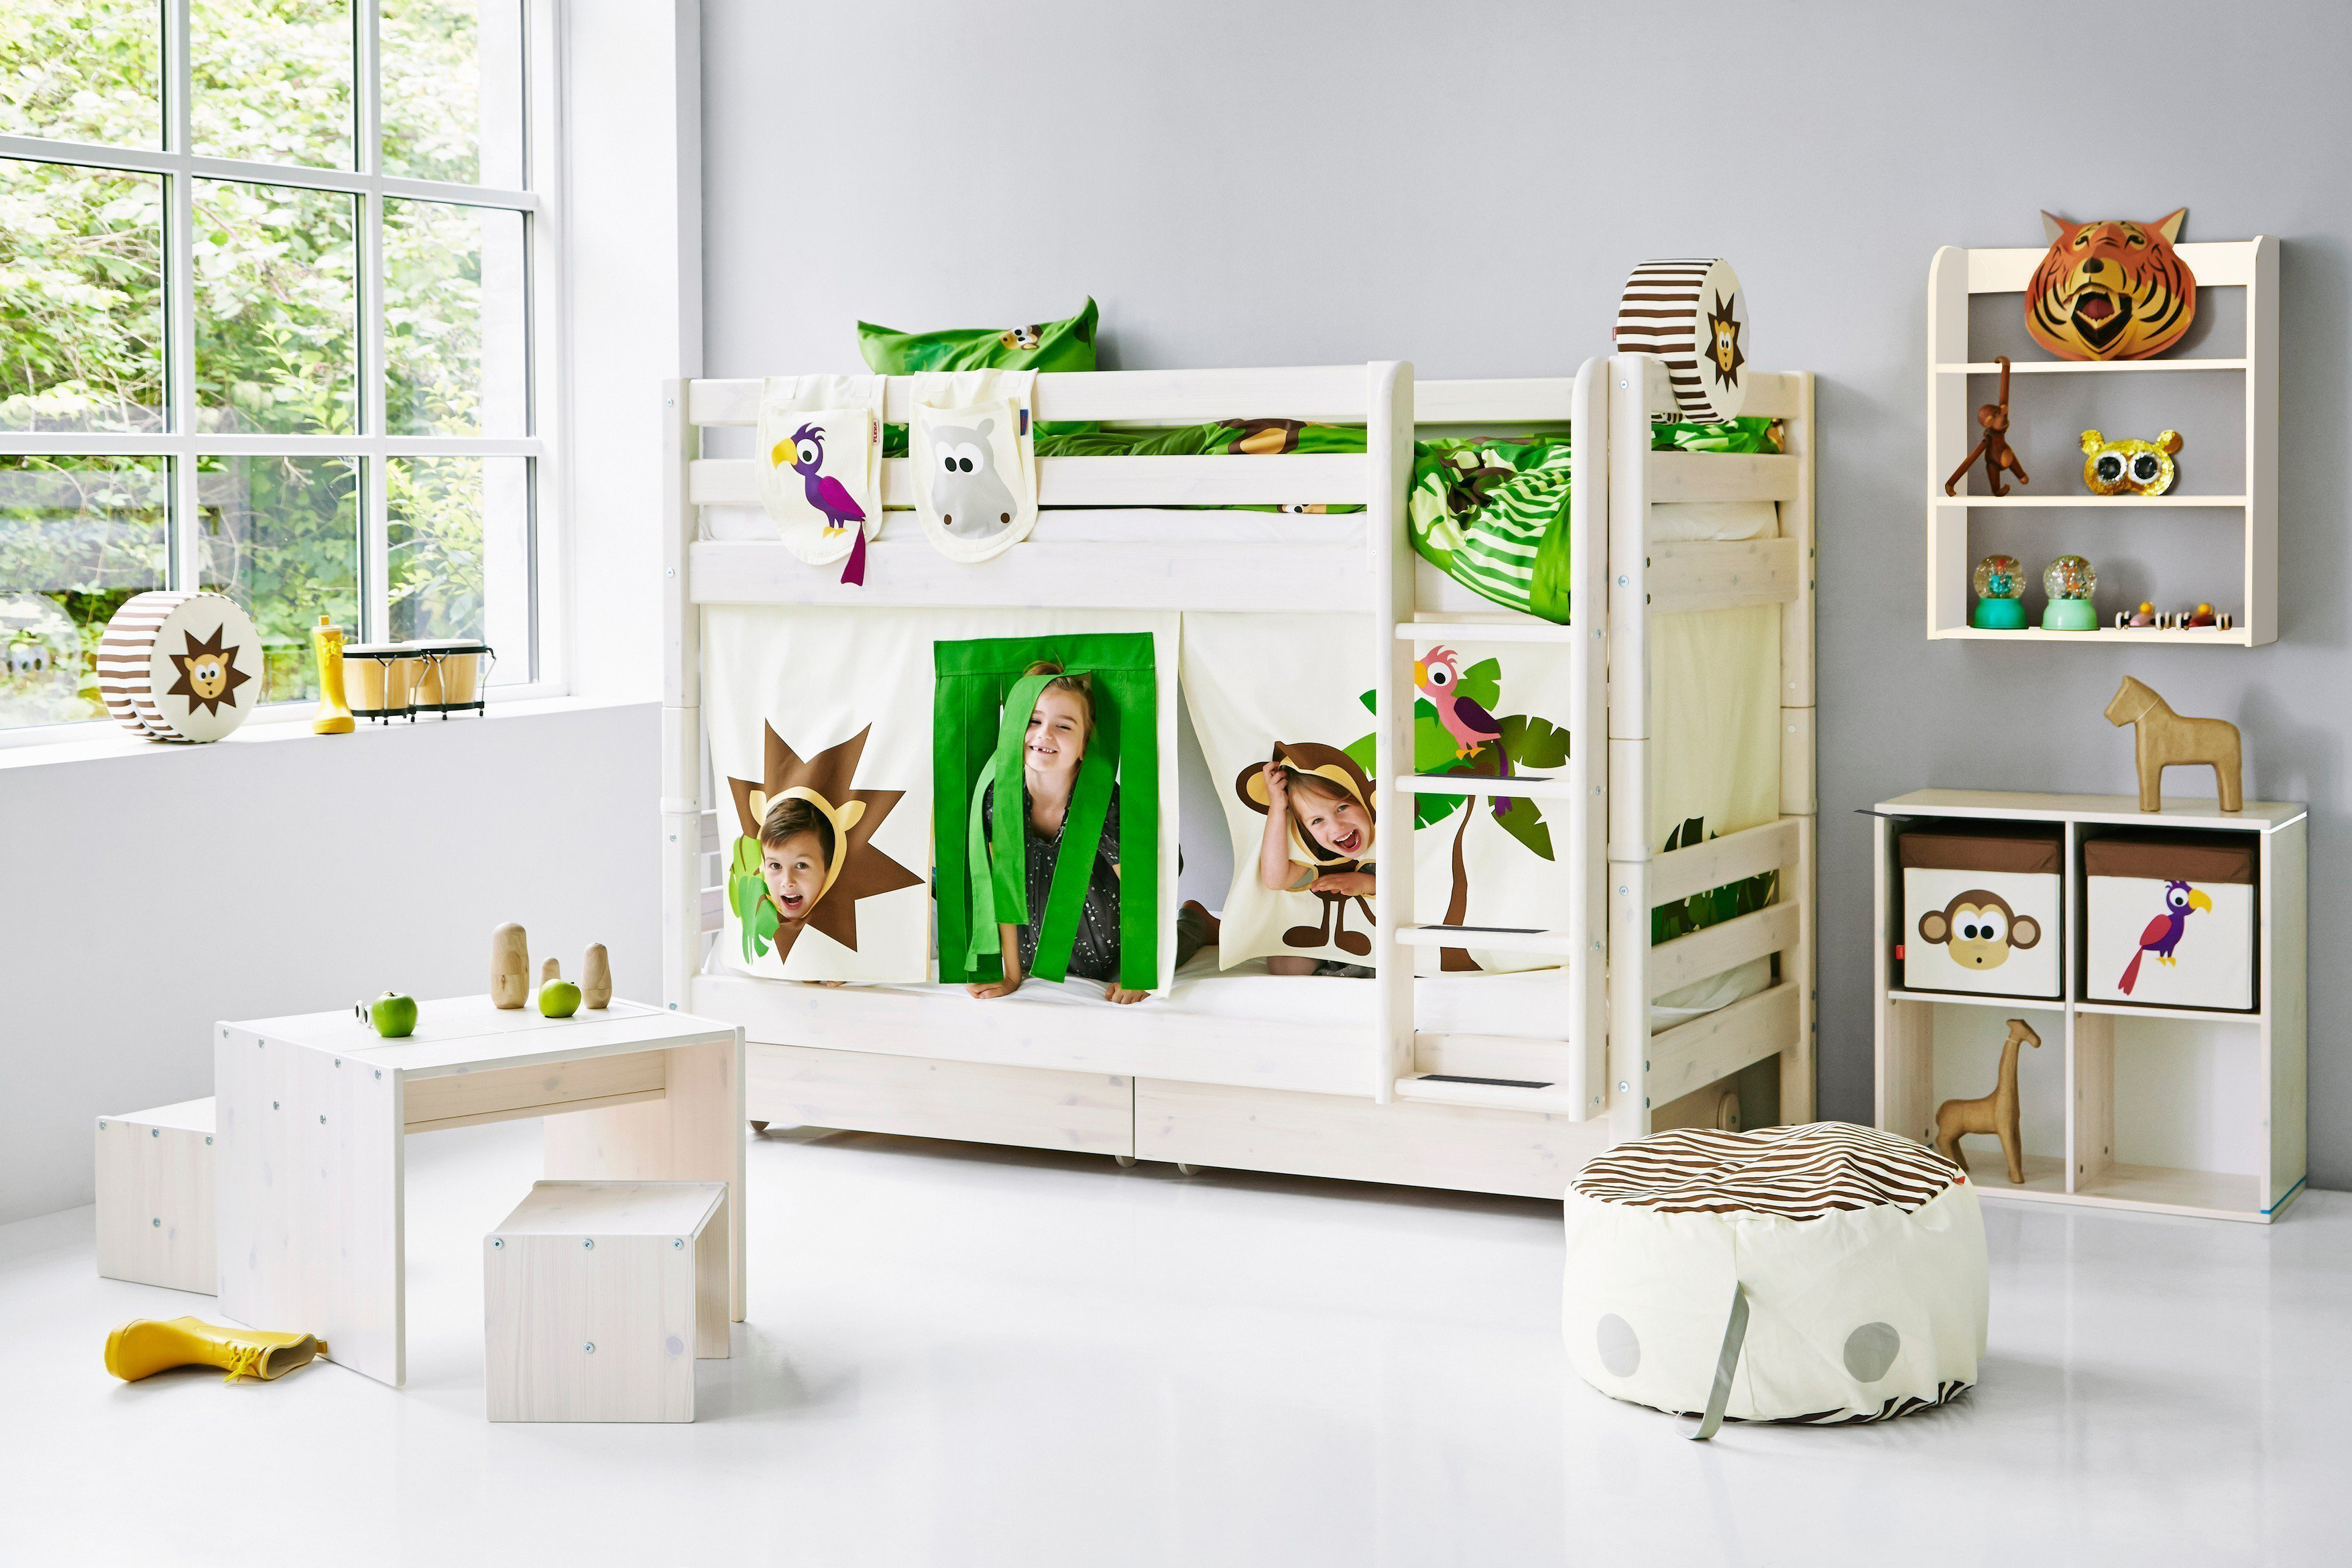 flexa classic doppelstockbett wei kiefer m bel letz ihr online shop. Black Bedroom Furniture Sets. Home Design Ideas